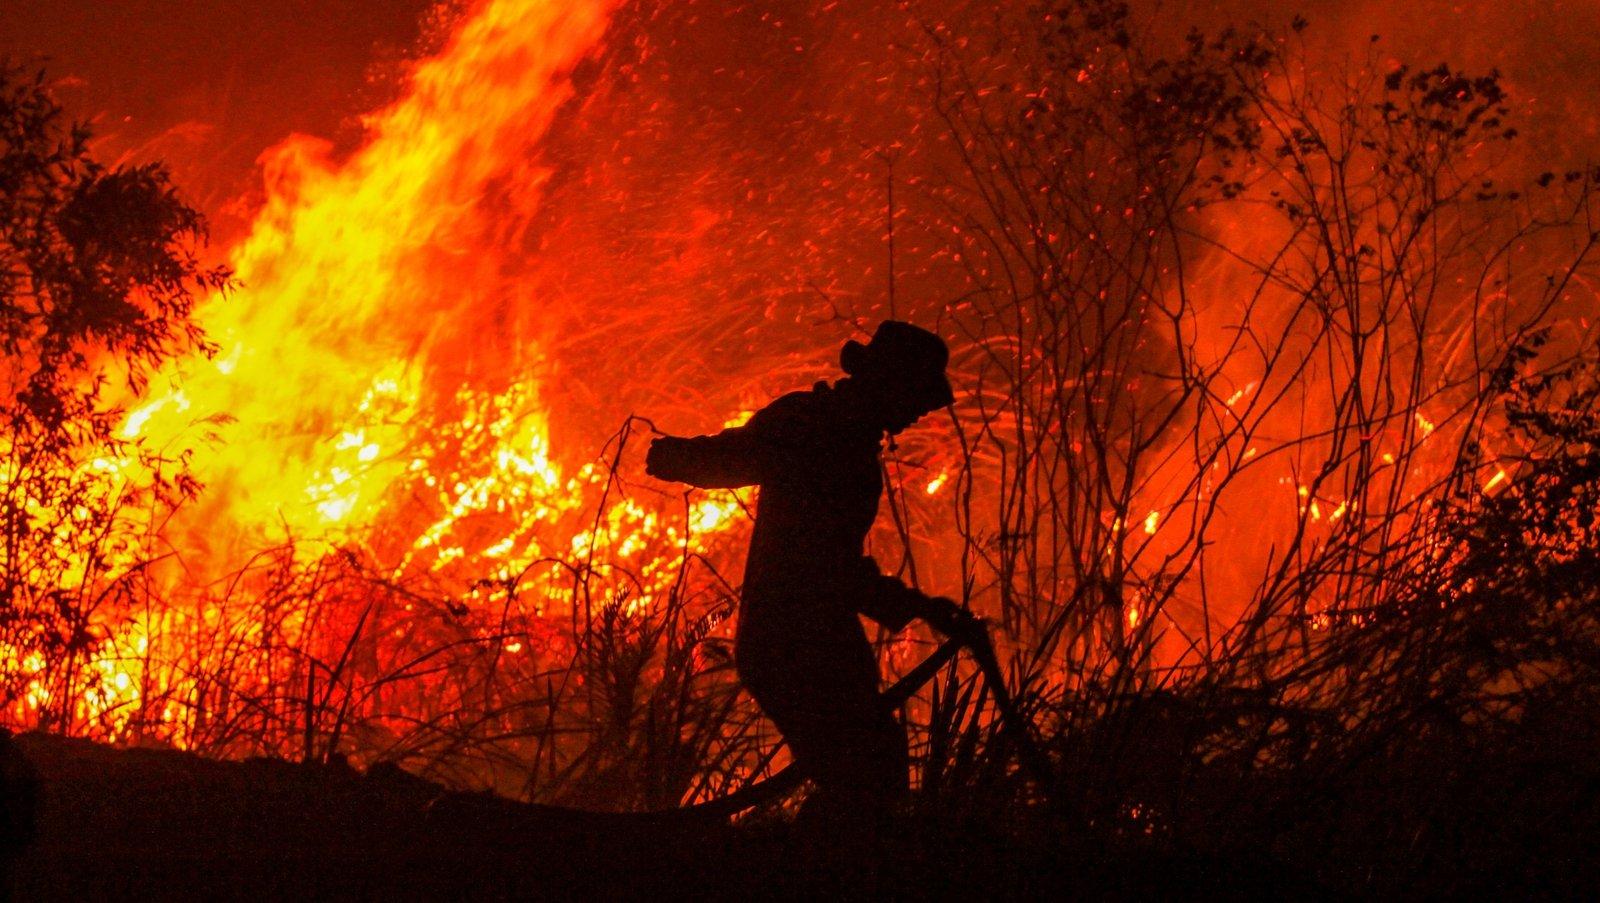 Indonesia, Australia fires stoke global warming fears - RTE.ie